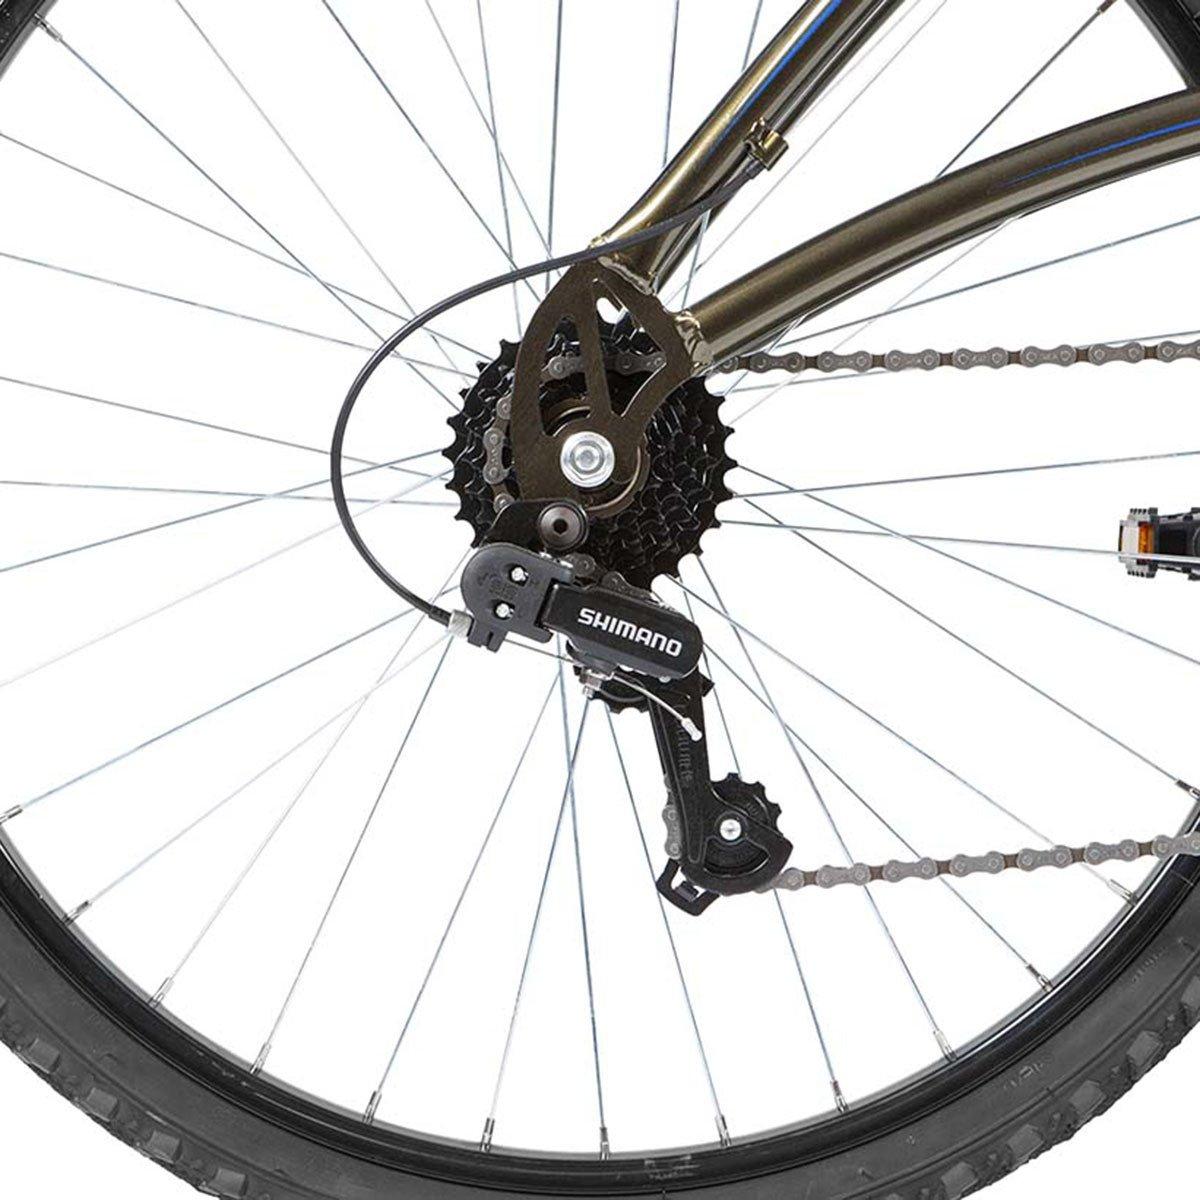 1220b3eeb Bicicleta Aro 26 - 21 Marchas 400 Lazer Verde - Caloi - Colombo